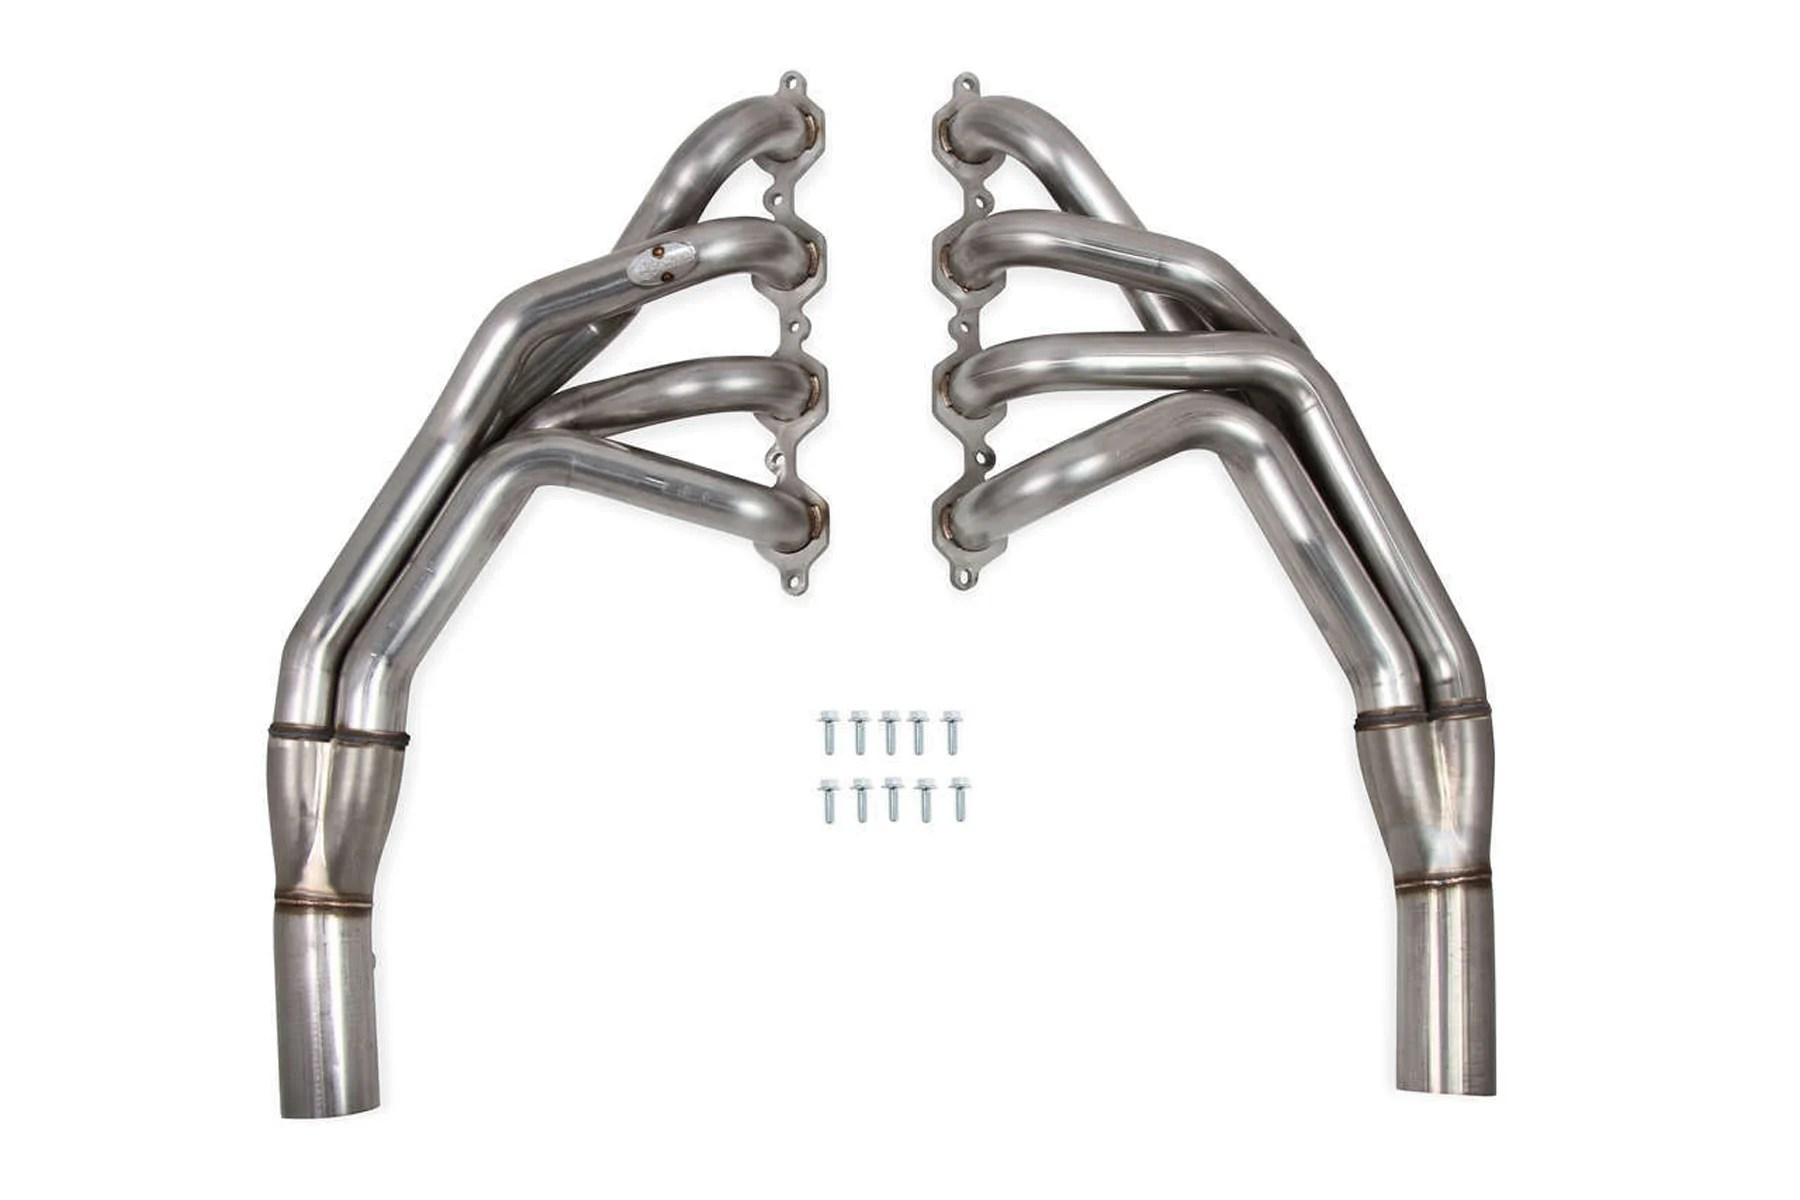 Ls1 Engine Swap Parts